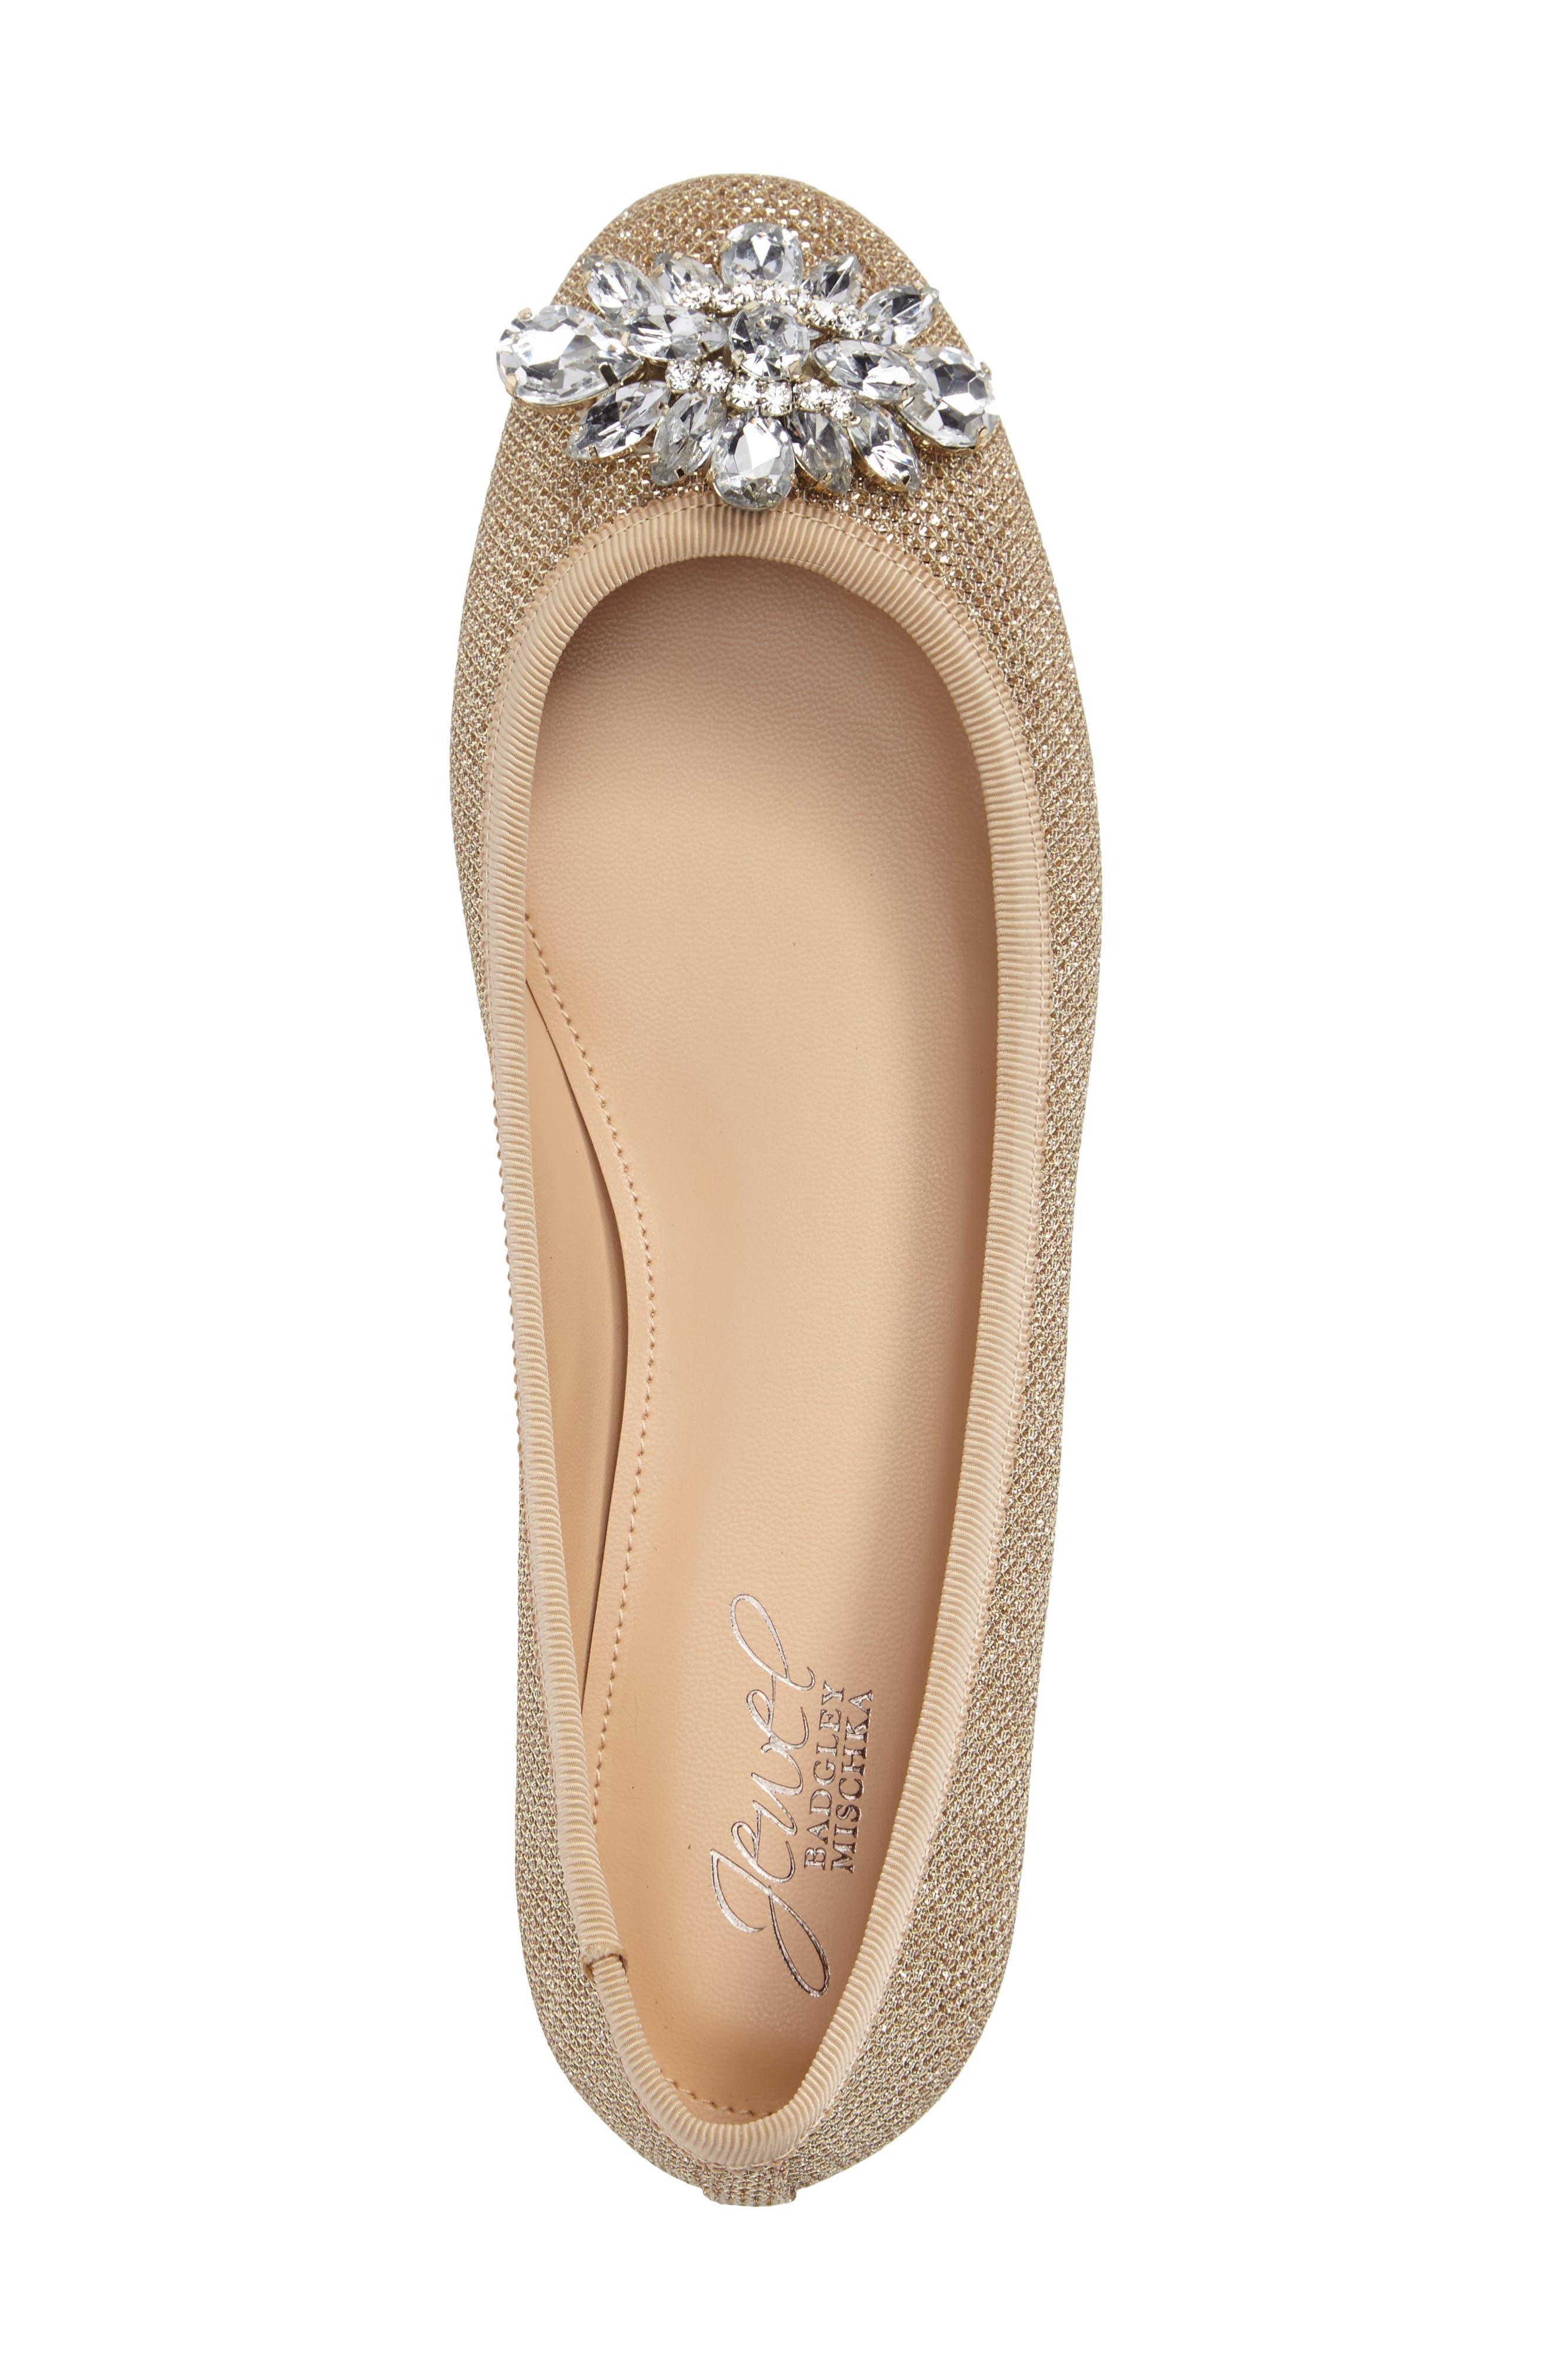 Alternate Image 3  - Jewel Badgley Mischka Cabella Embellished Ballet Flat (Women)